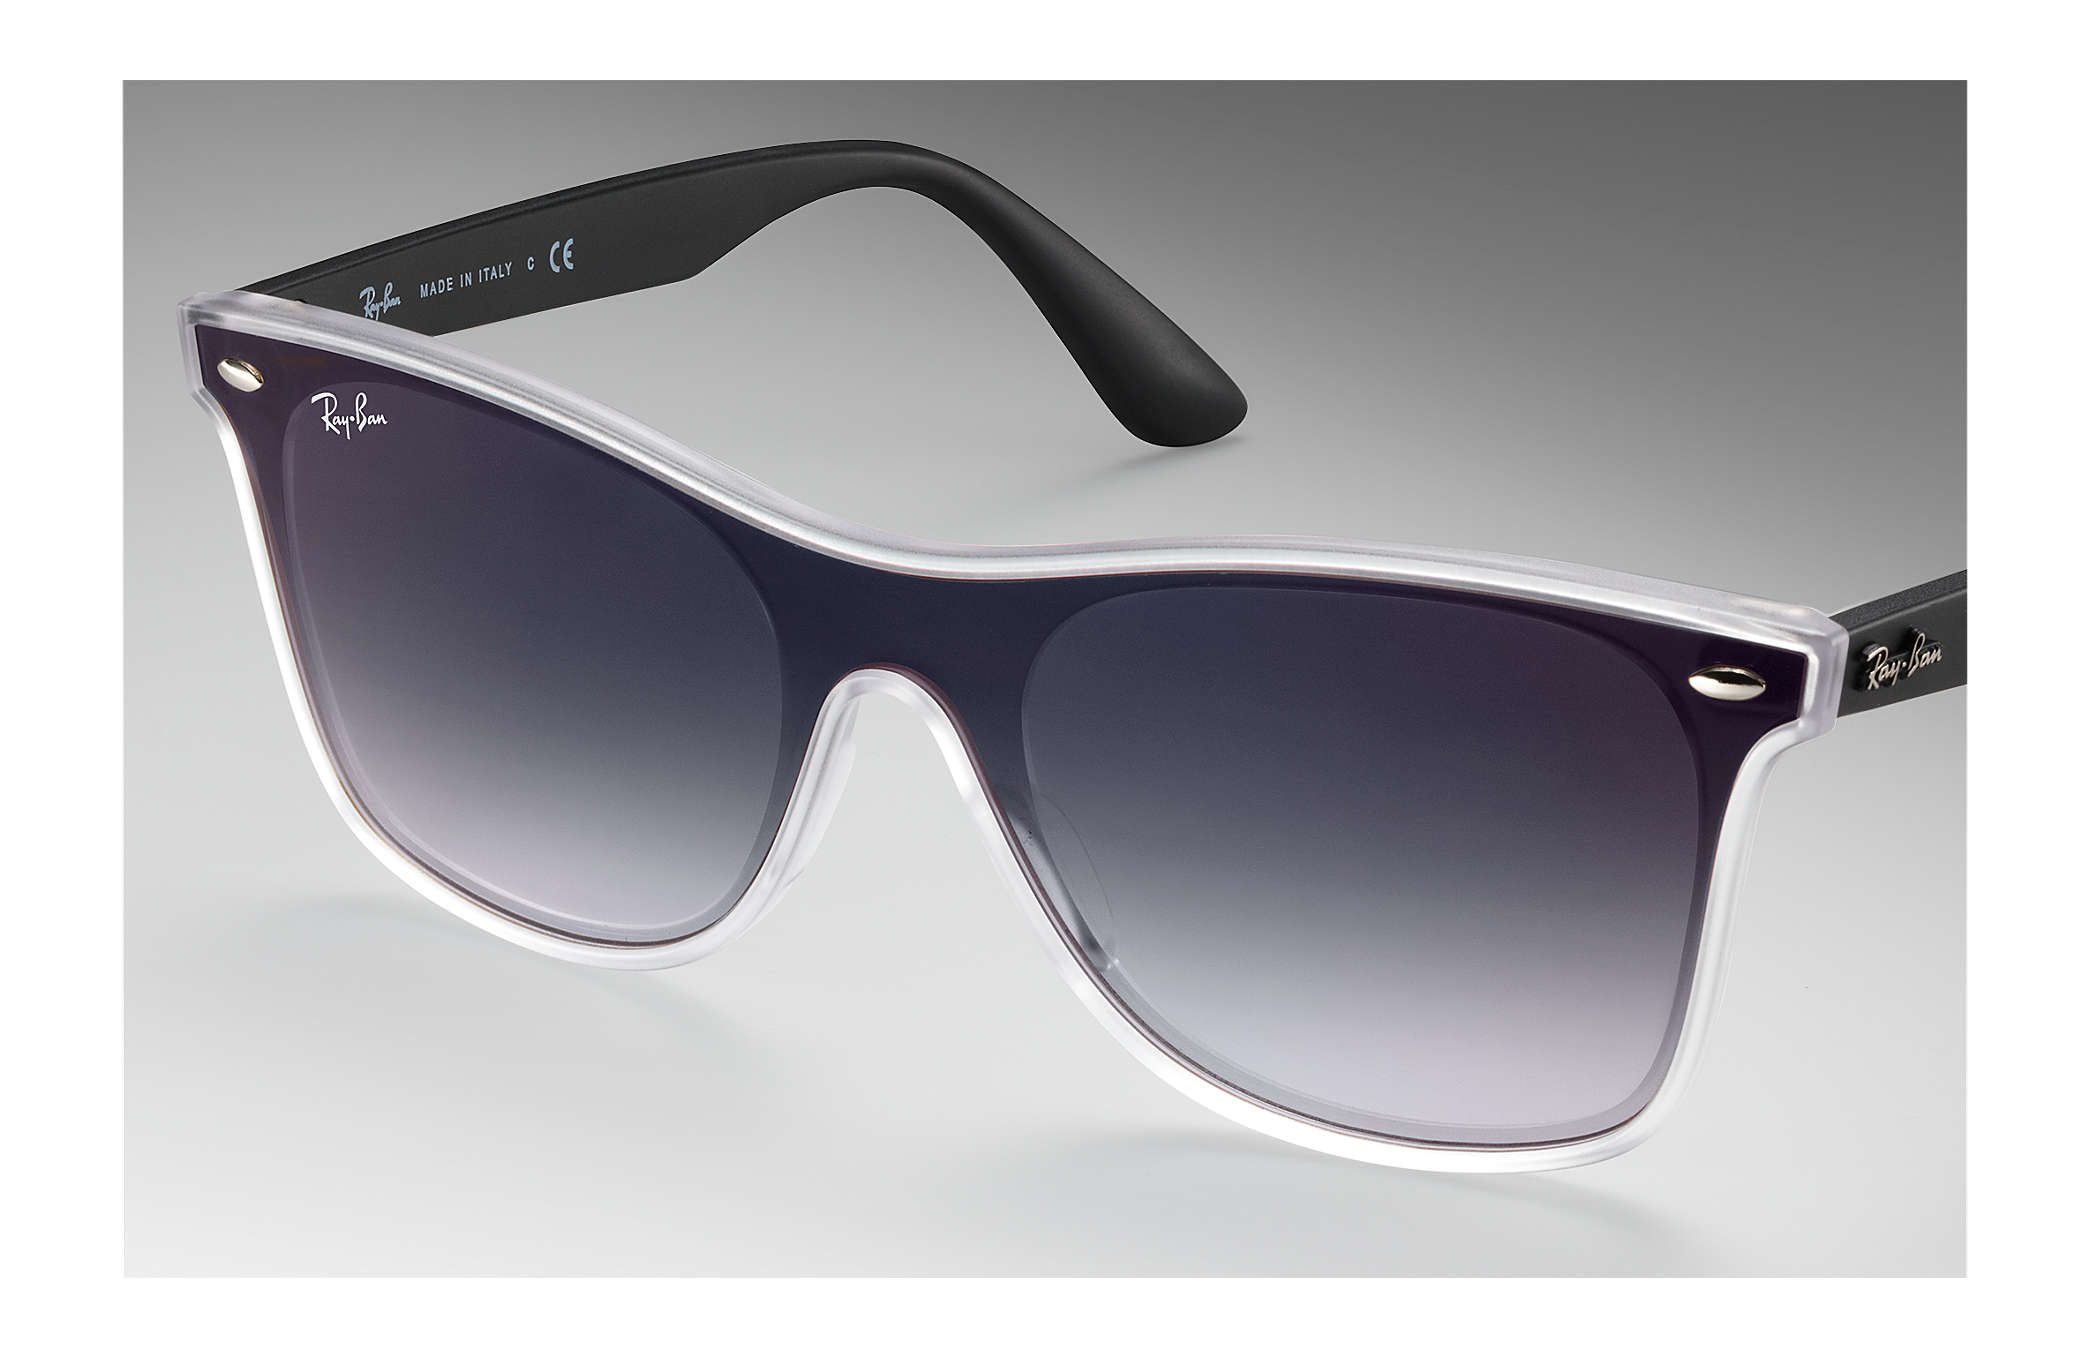 957adc0343aeb Ray-Ban Blaze Wayfarer RB4440N Transparent - Nylon - Grey Lenses ...